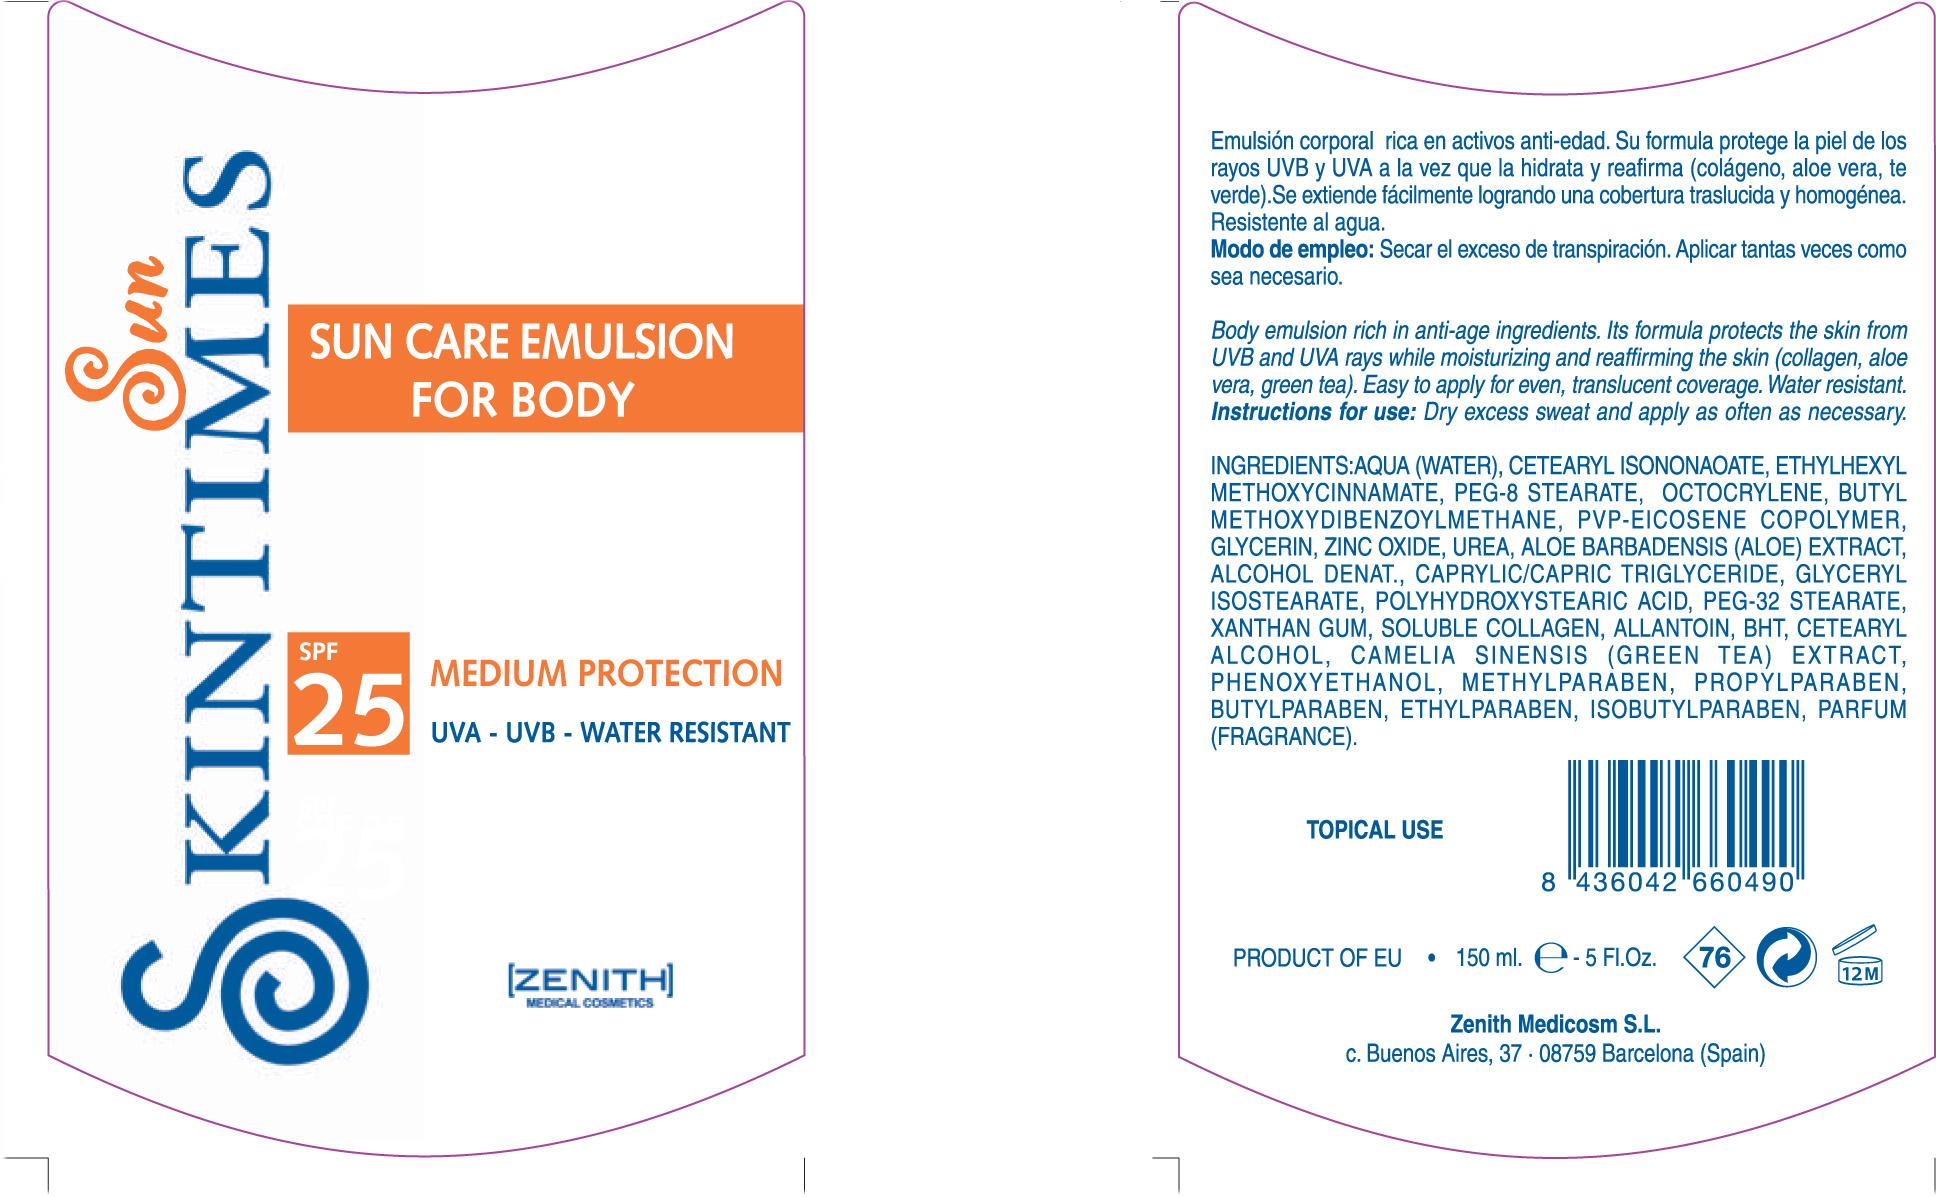 Sun Care For Body (Octinoxate Avobenzone Zinc Oxide Octocrylene) Emulsion [Zenith Medicosm Sl]